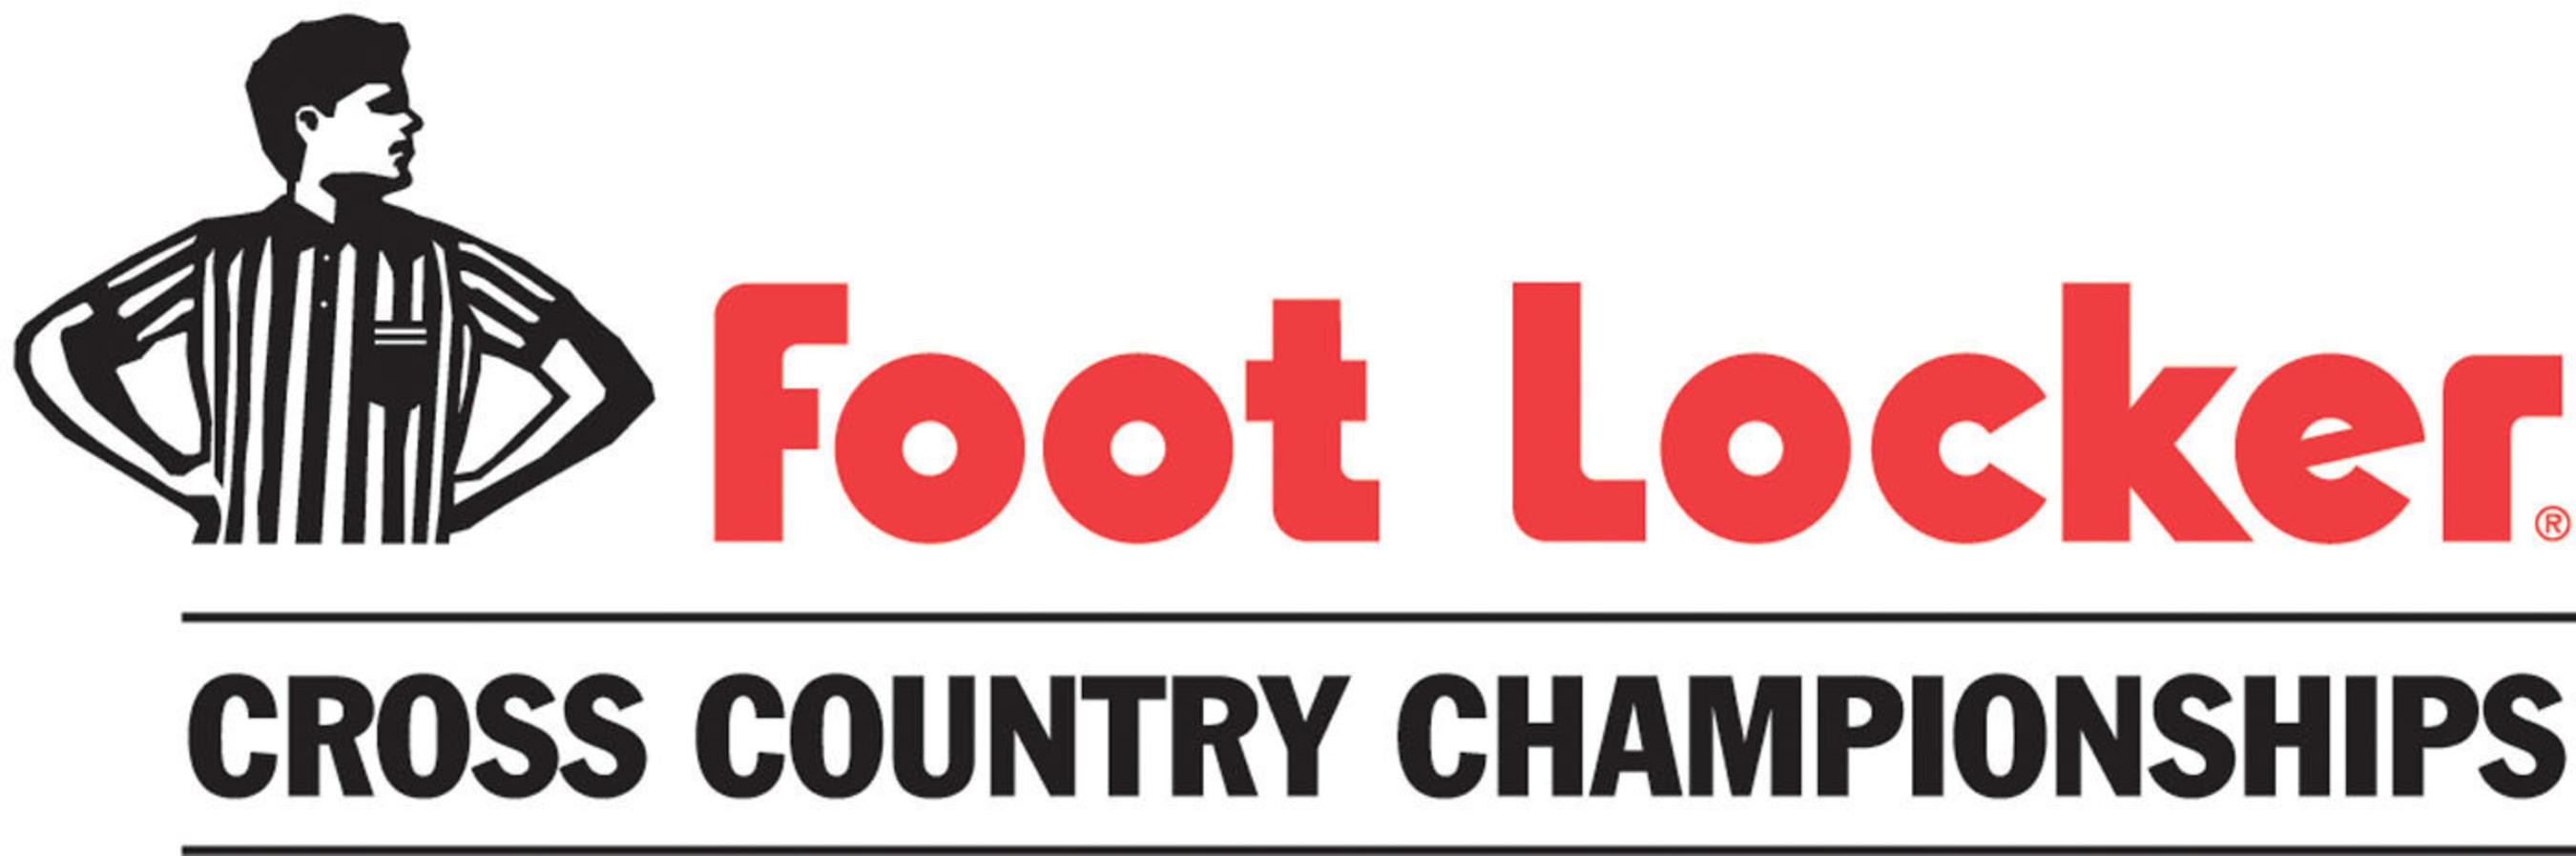 Foot Locker Cross Country Championships.